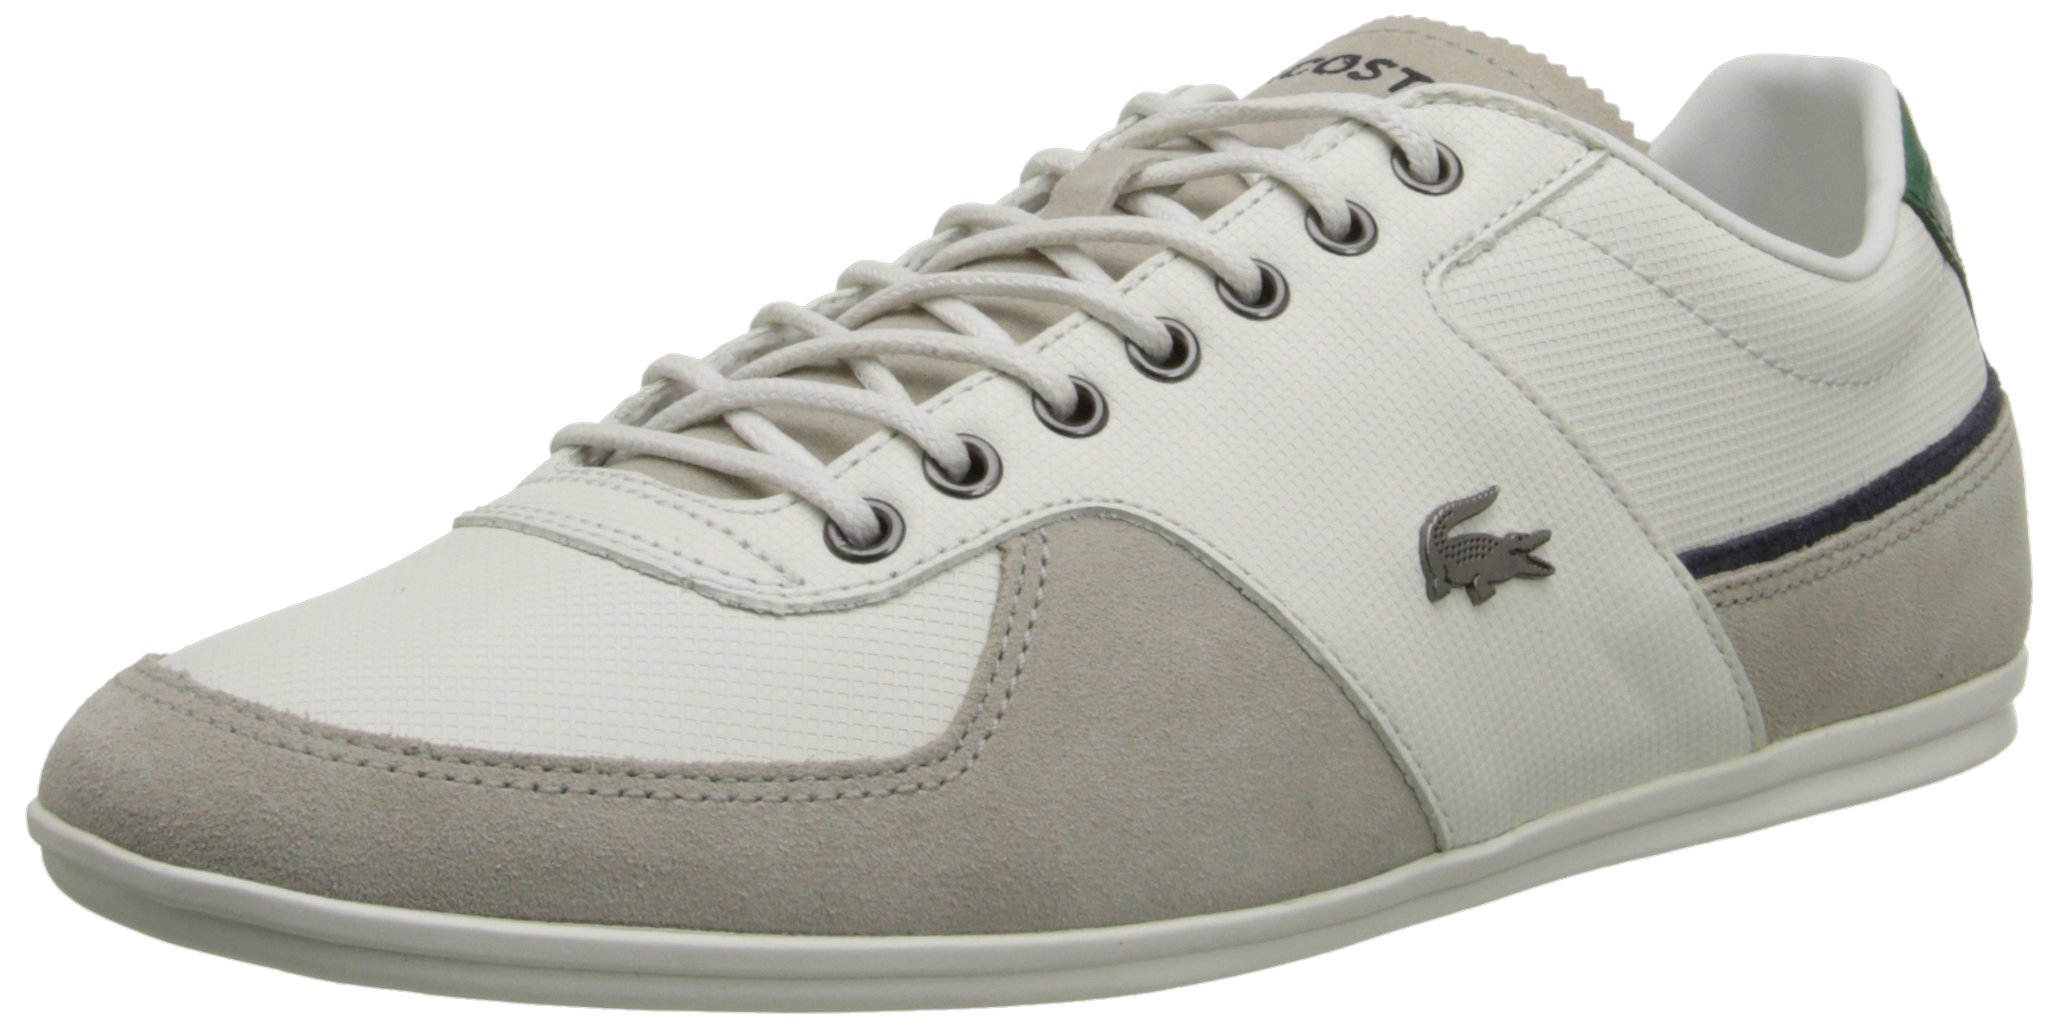 Lacoste Men's Taloire 15 Fashion Sneaker, Off White, 12 M US